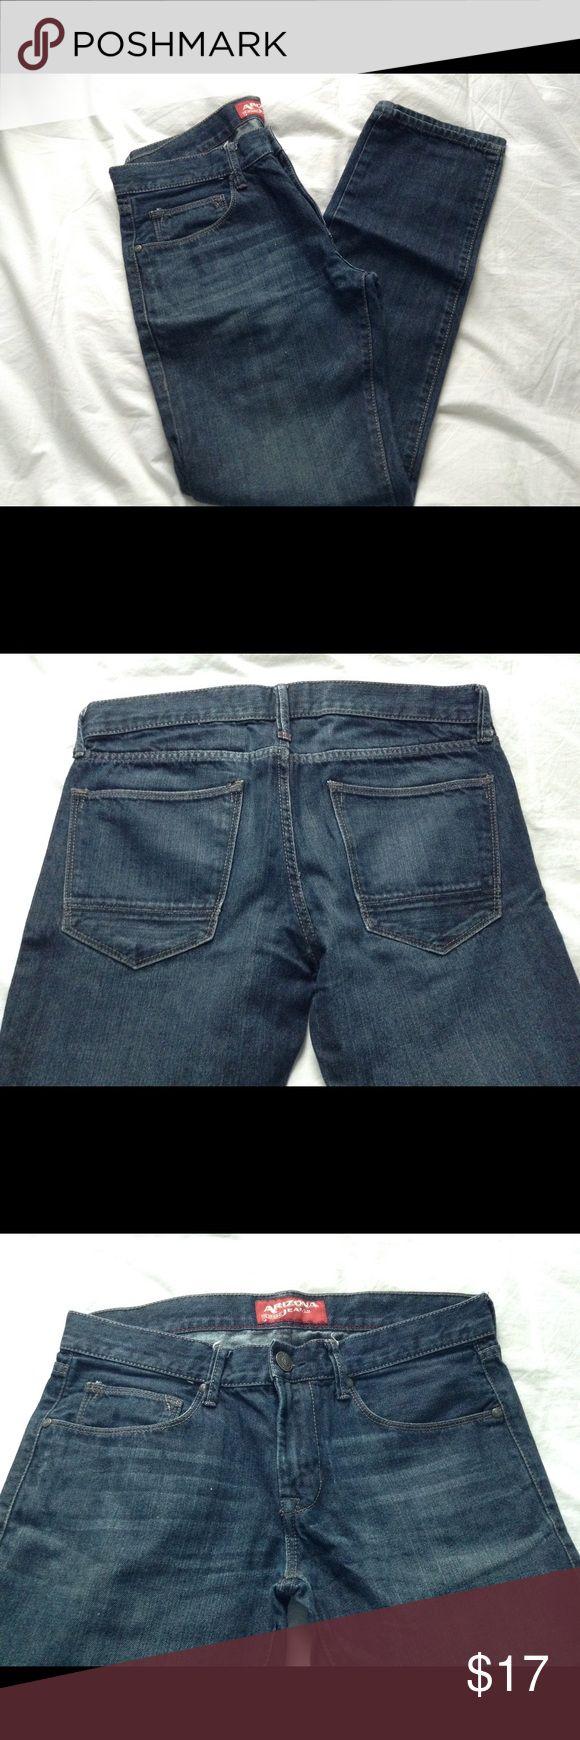 Men's Levi Jeans Men's levi jeans never worn in perfect condition. Levi's Jeans Slim